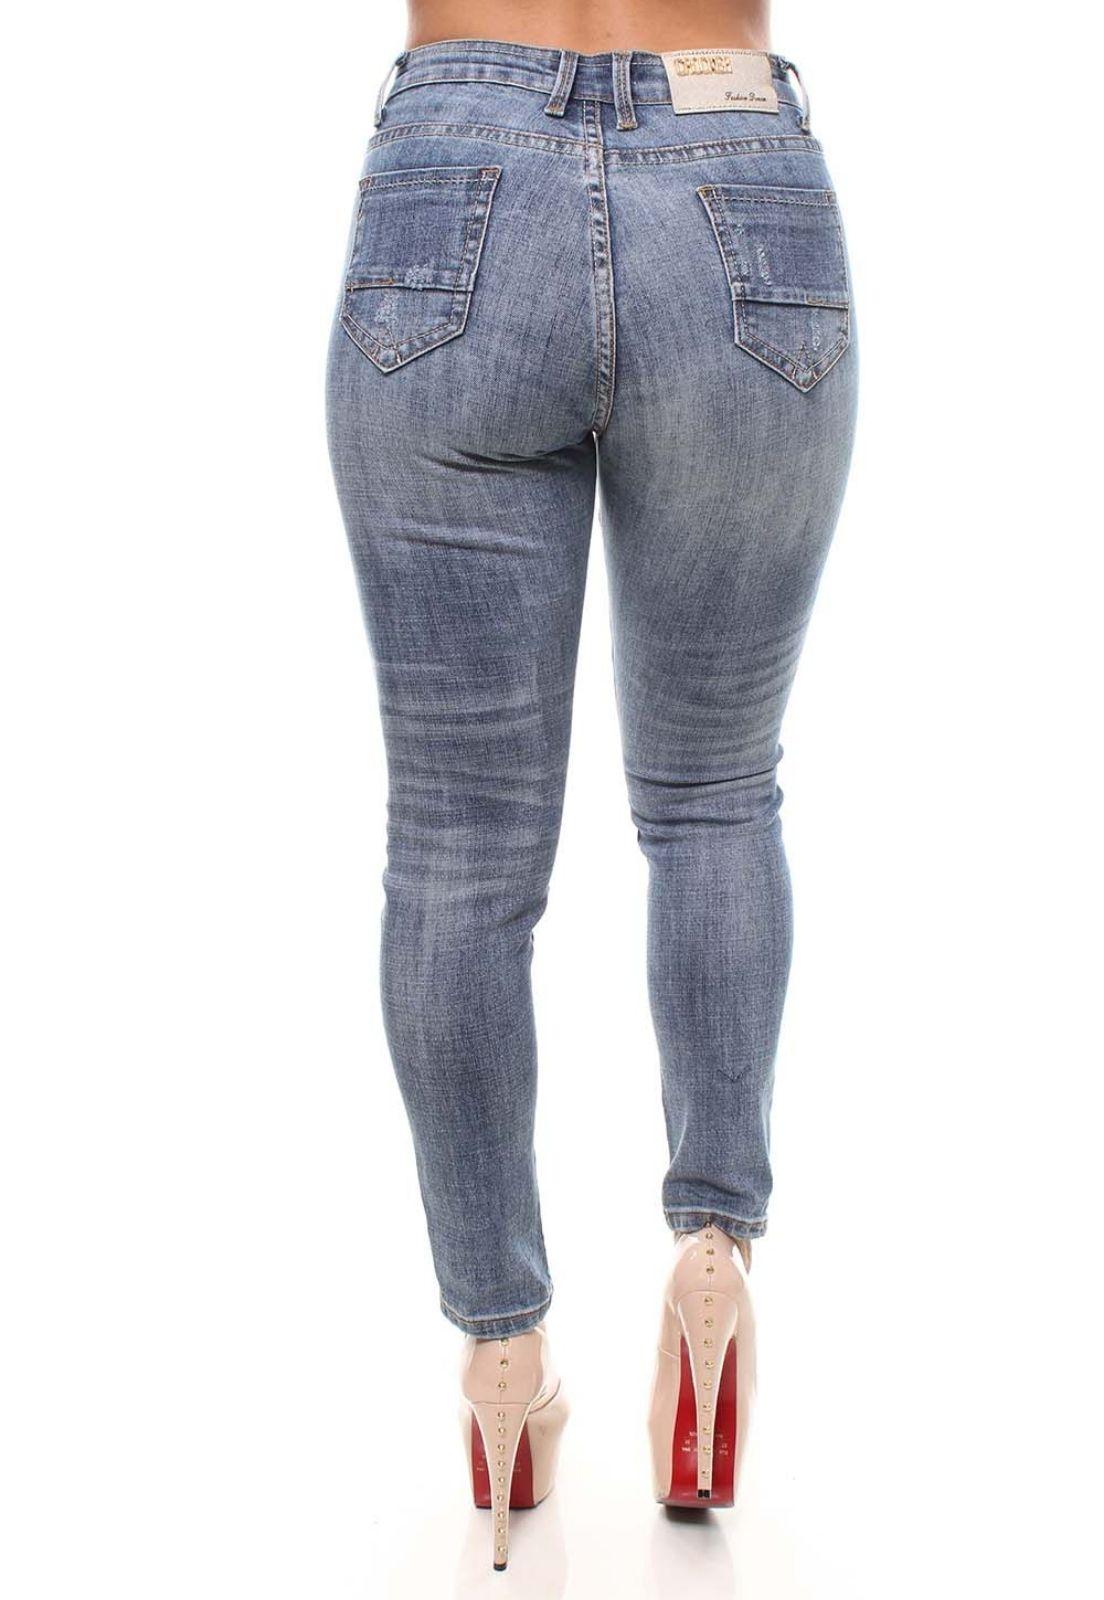 Cigarrete Jeans Feminina Crocker - 46395  - CROCKER JEANS